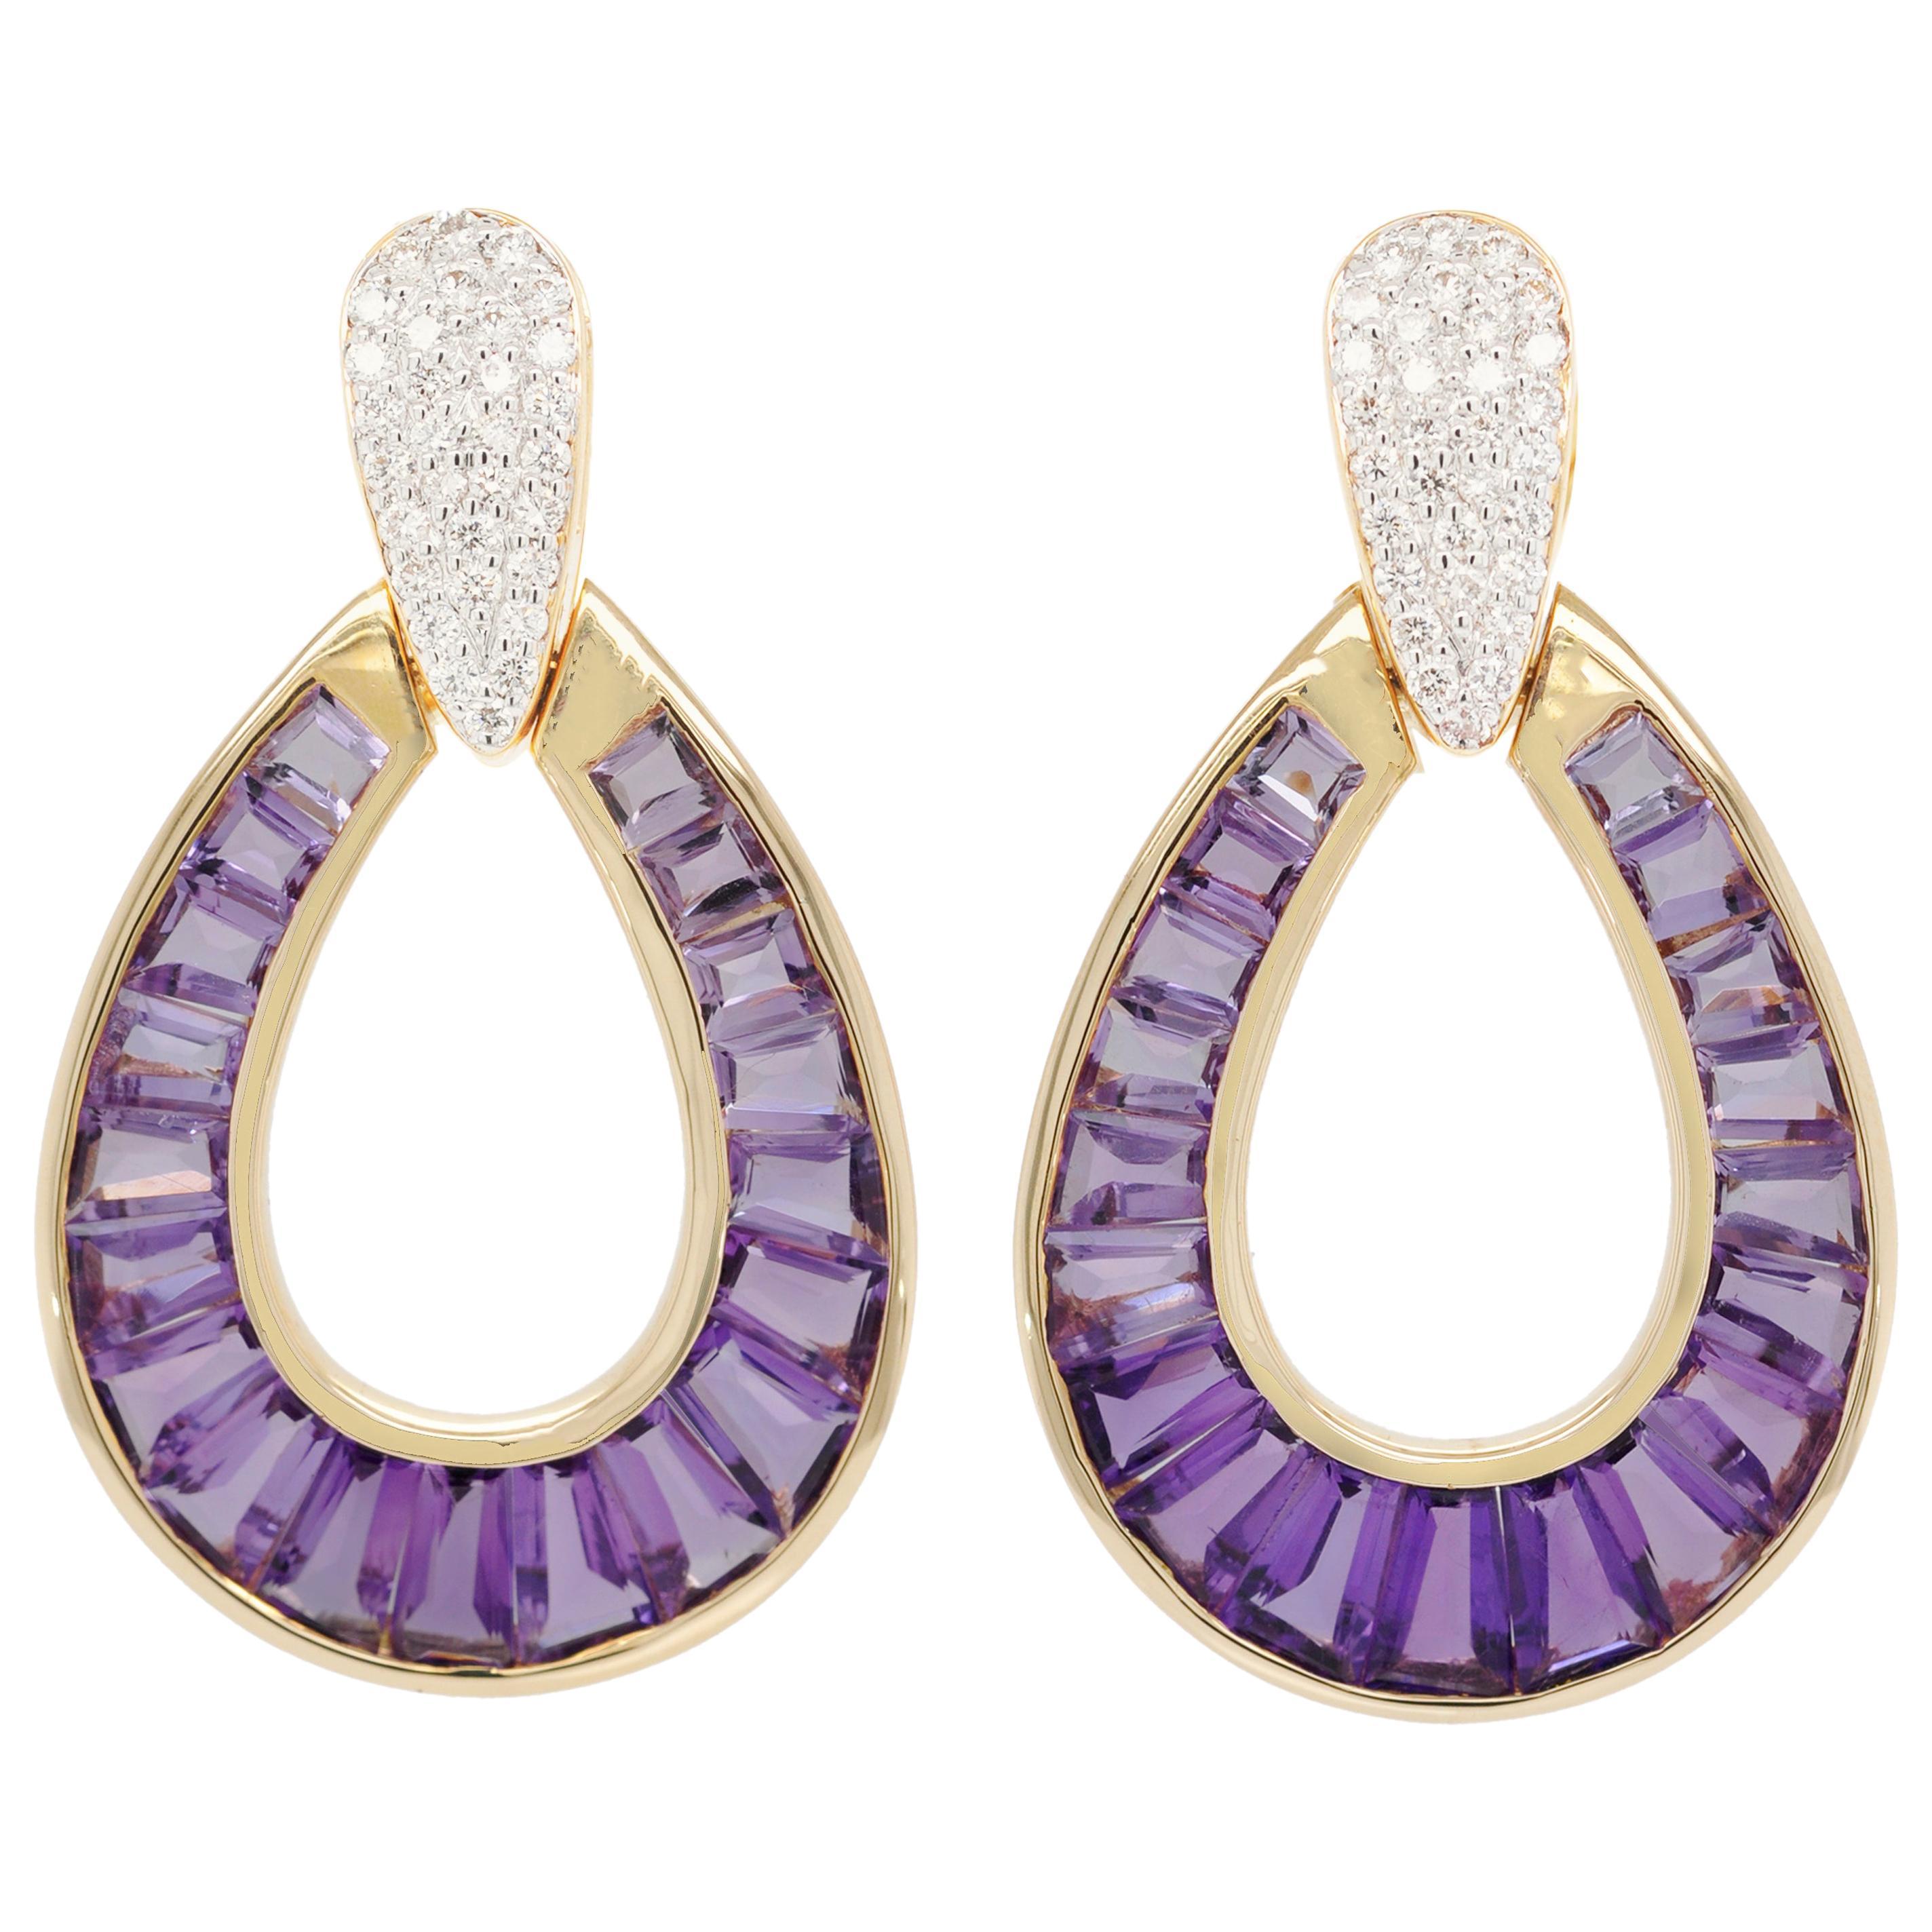 18 Karat Gold Calibre Cut Amethyst Taper Baguette Diamond Dangling Drop Earrings